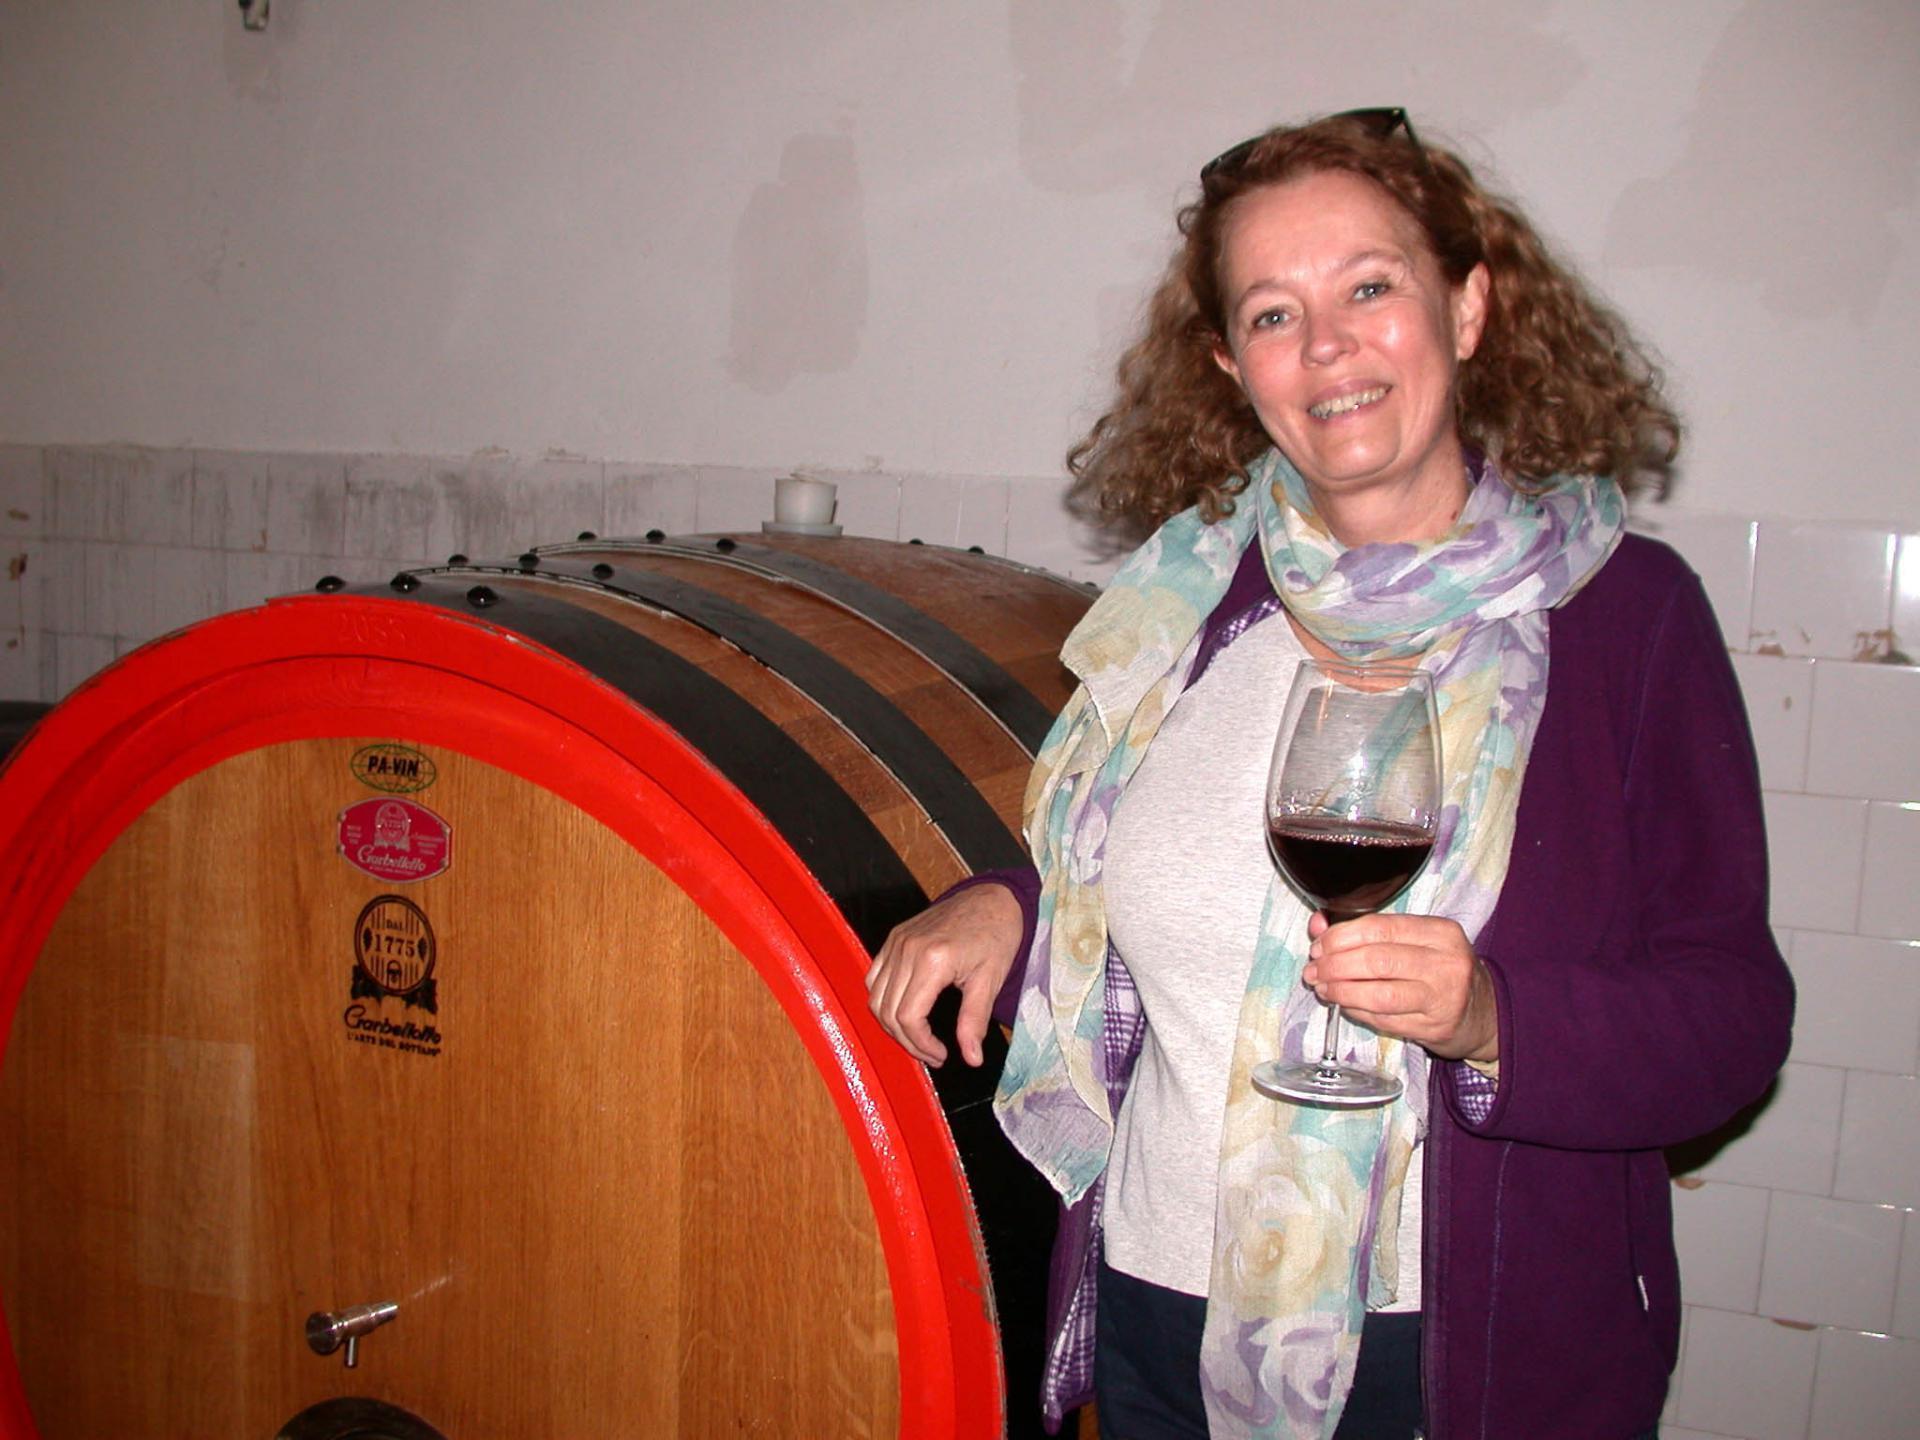 Jo Ahearne - ponosna vlasnica četiriju vinskih etiketa s otoka Hvara